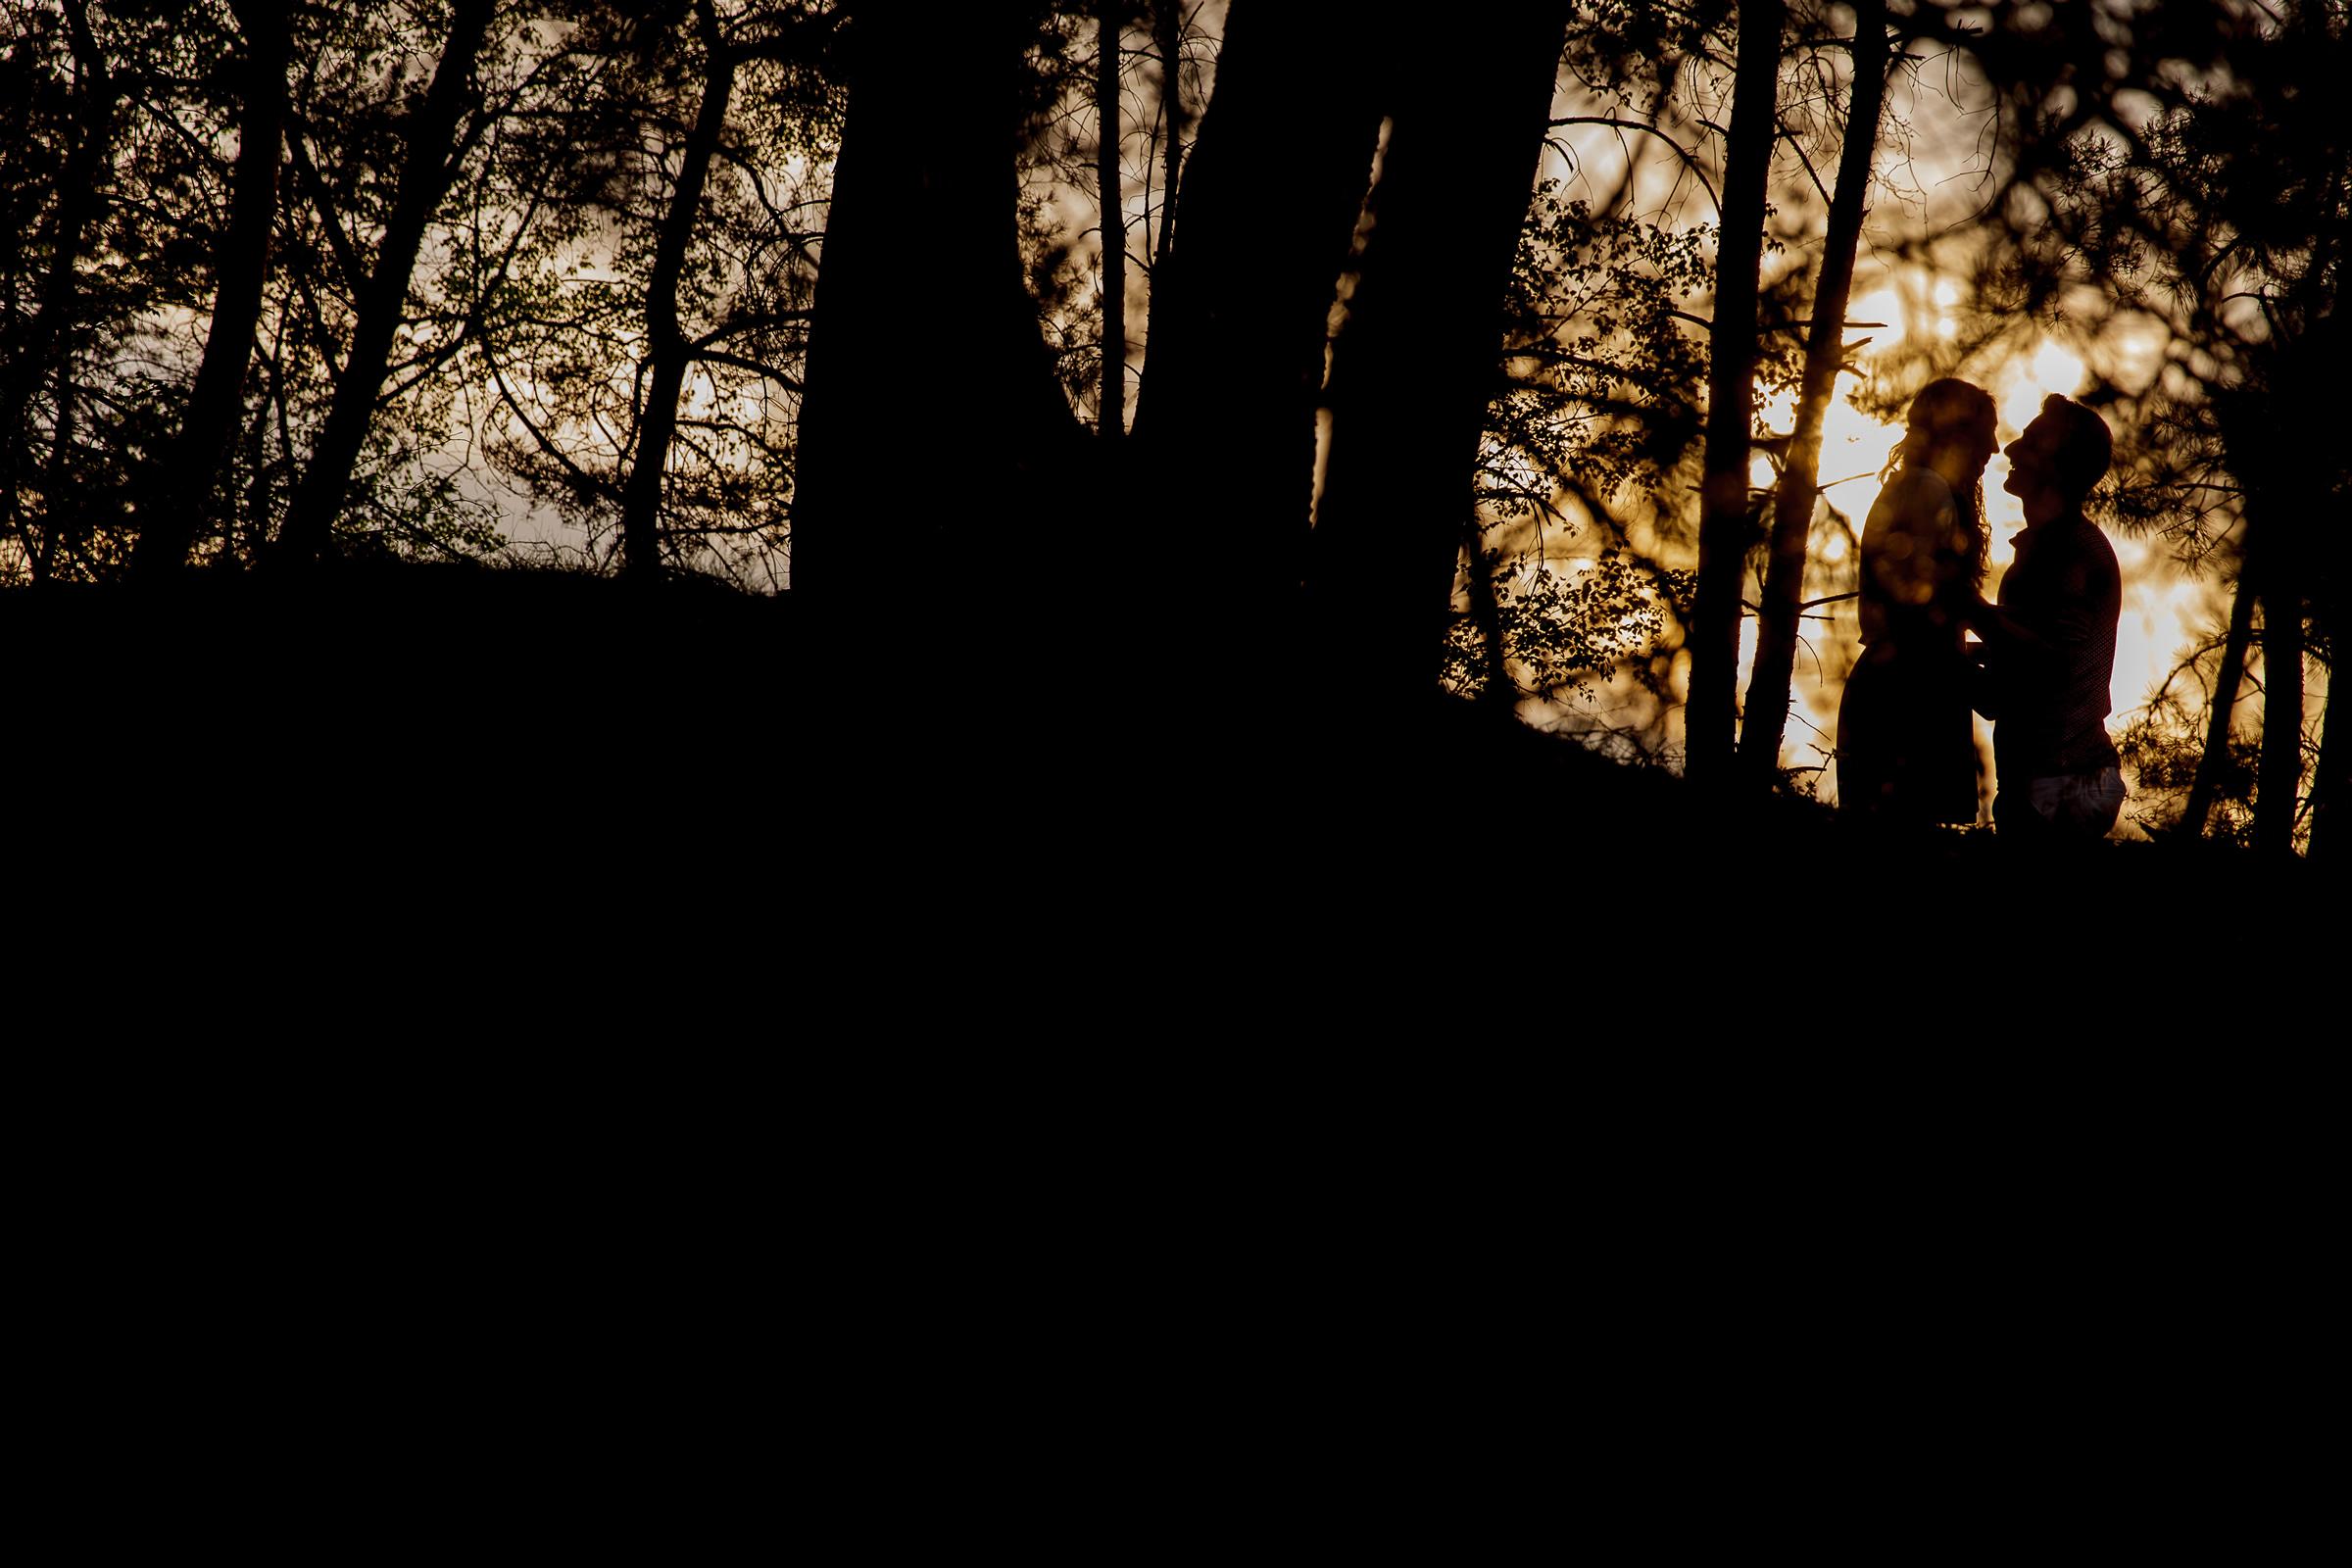 2016 – Hendrik en Alise – Silhouet – Tree's – Sun – 6